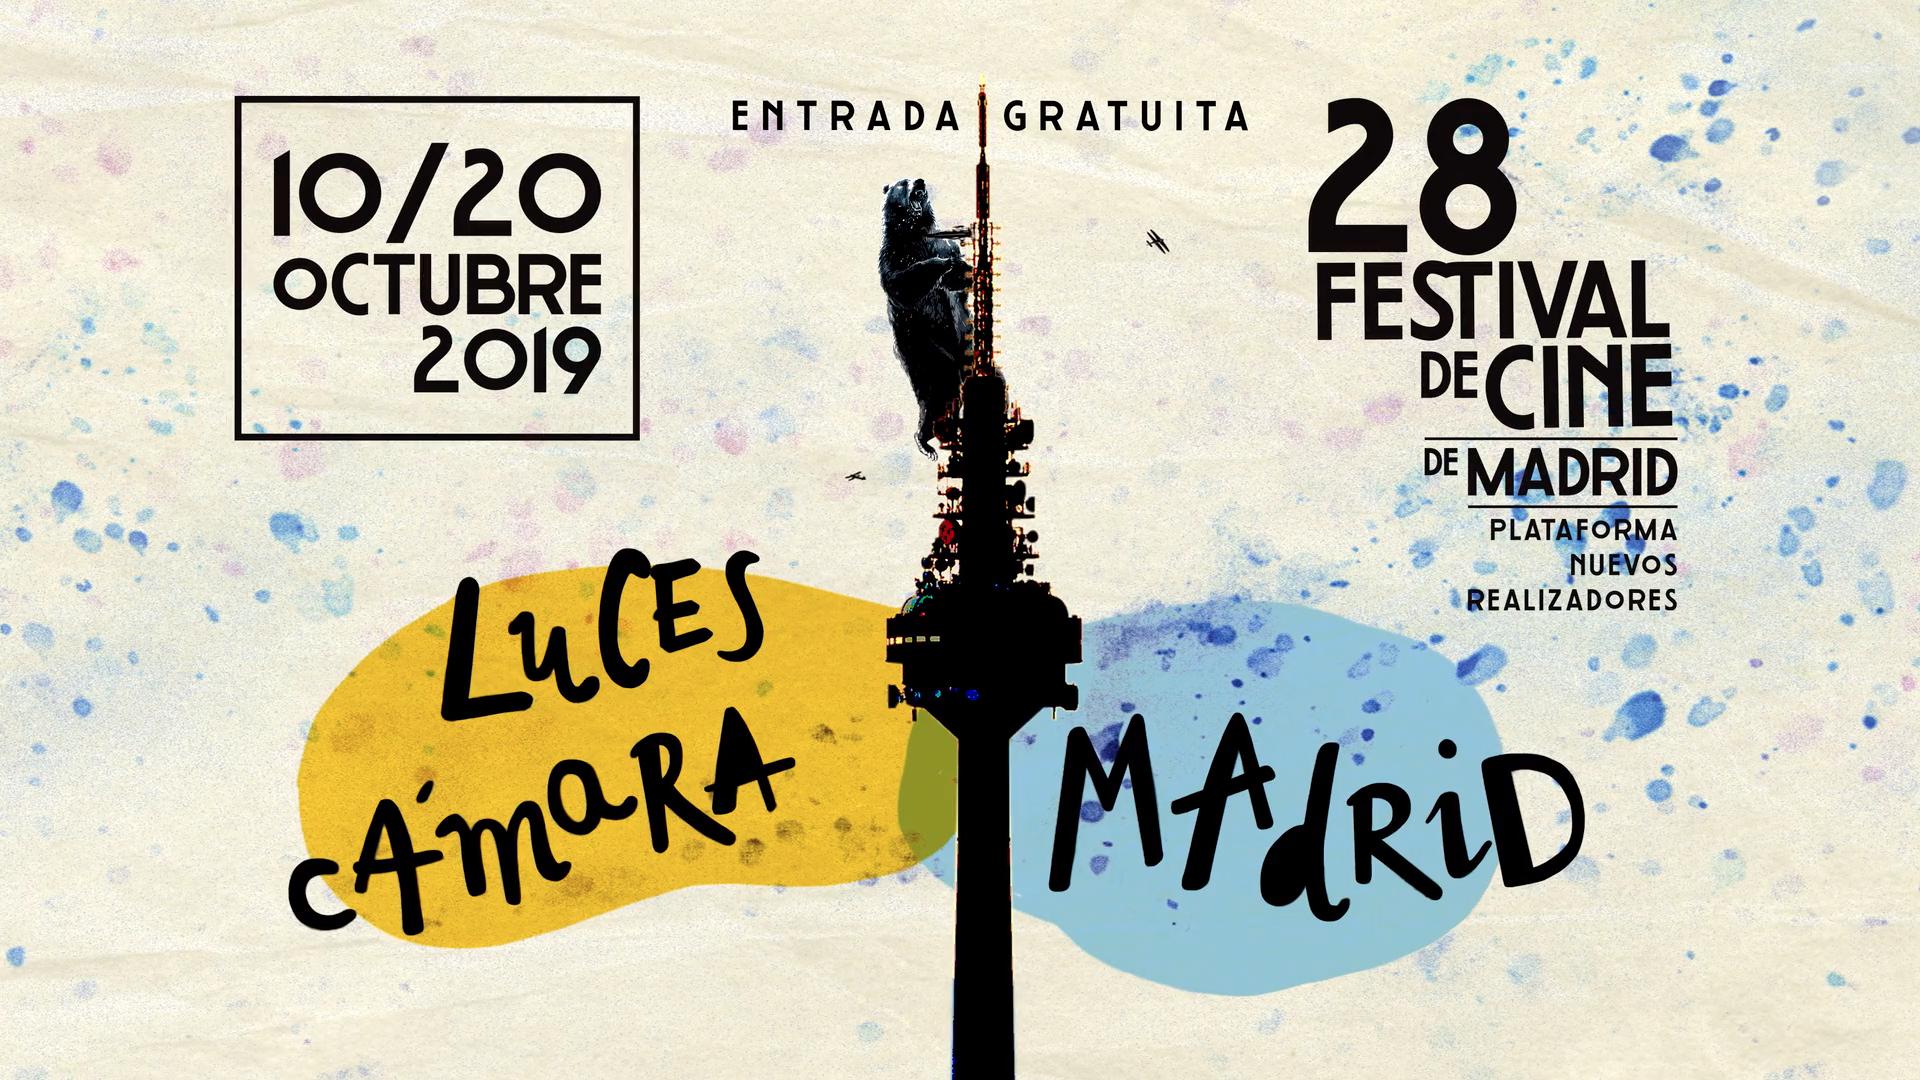 MOTION GRAPHICS CARTELA FESTIVAL DE CINE DE MADRID PNR. IMAGERIAL PRODUCCIONES.